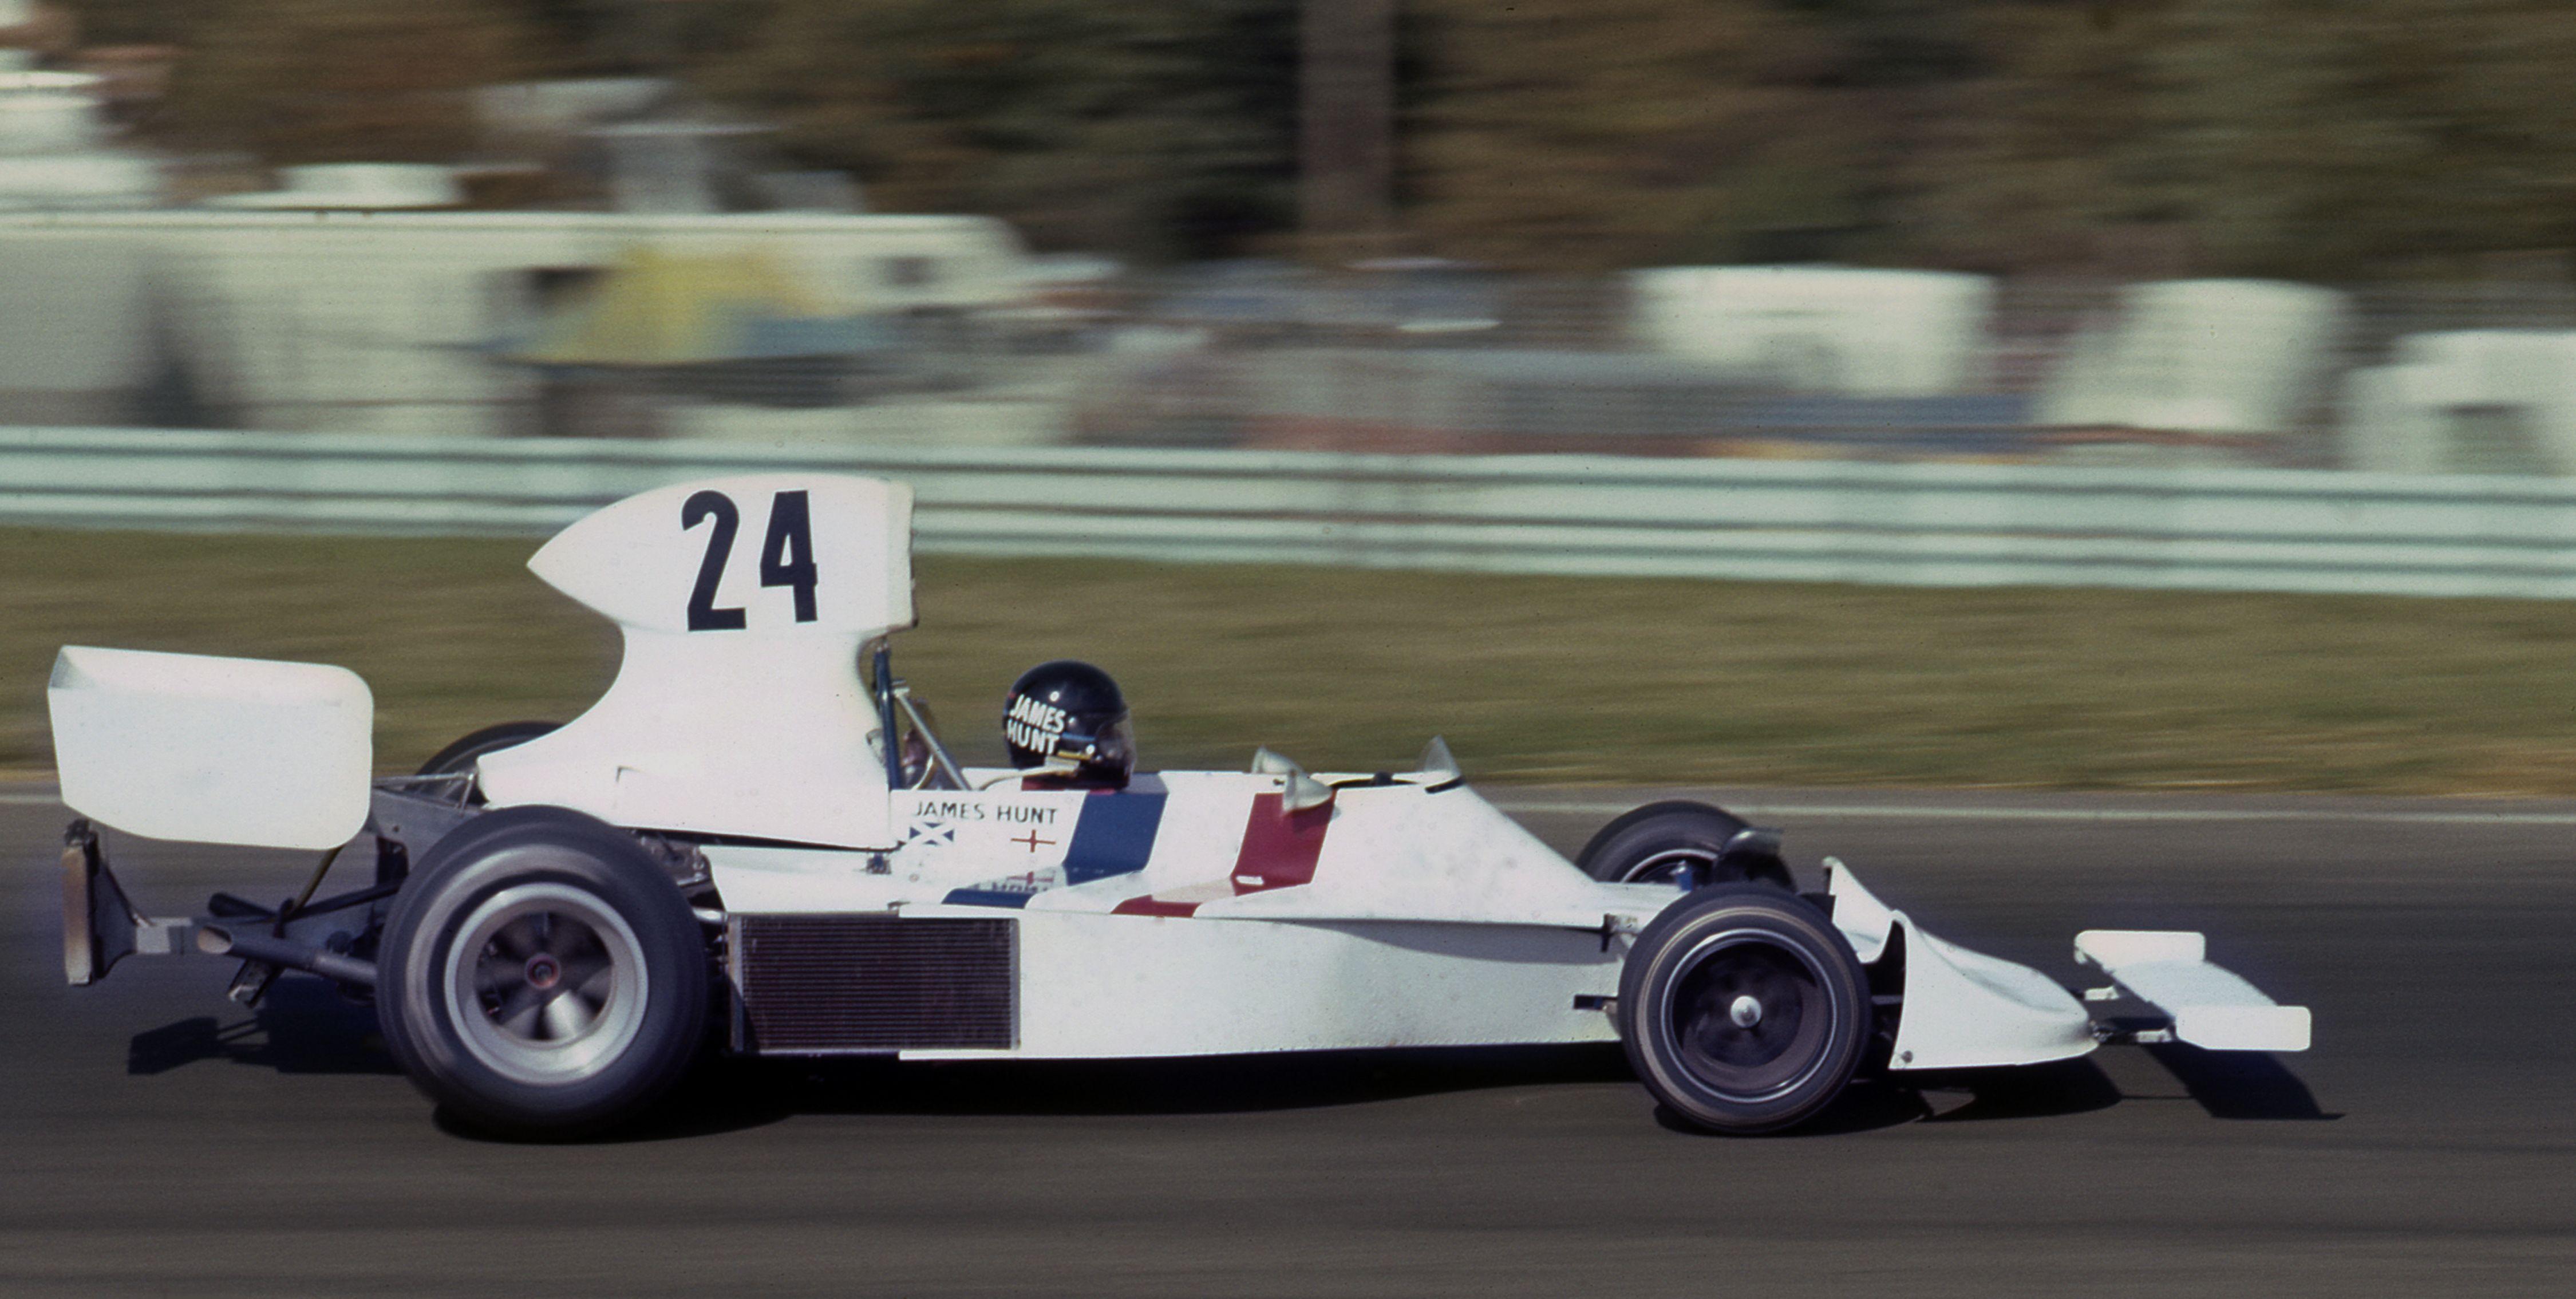 James Hunt, Hesketh, USA, 1974